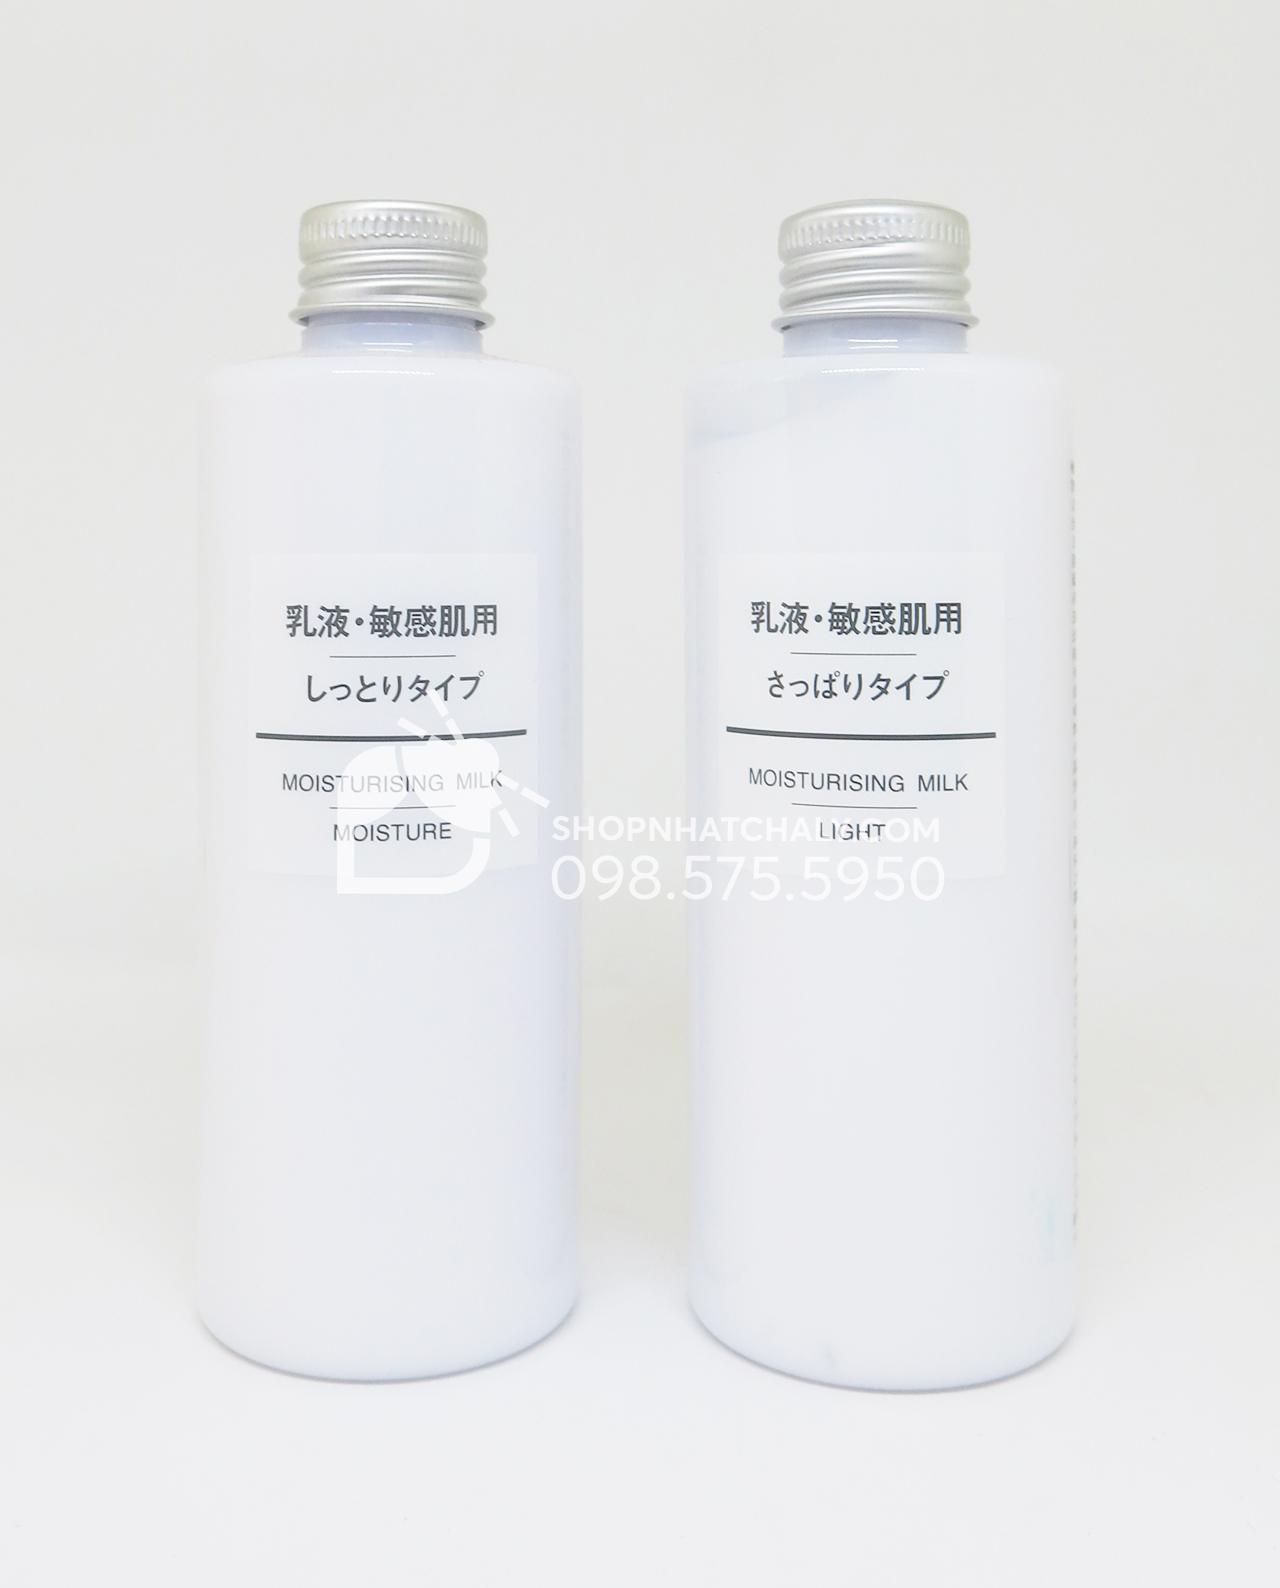 Sữa dưỡng da Muji Moisturising Milk Light và Moisture